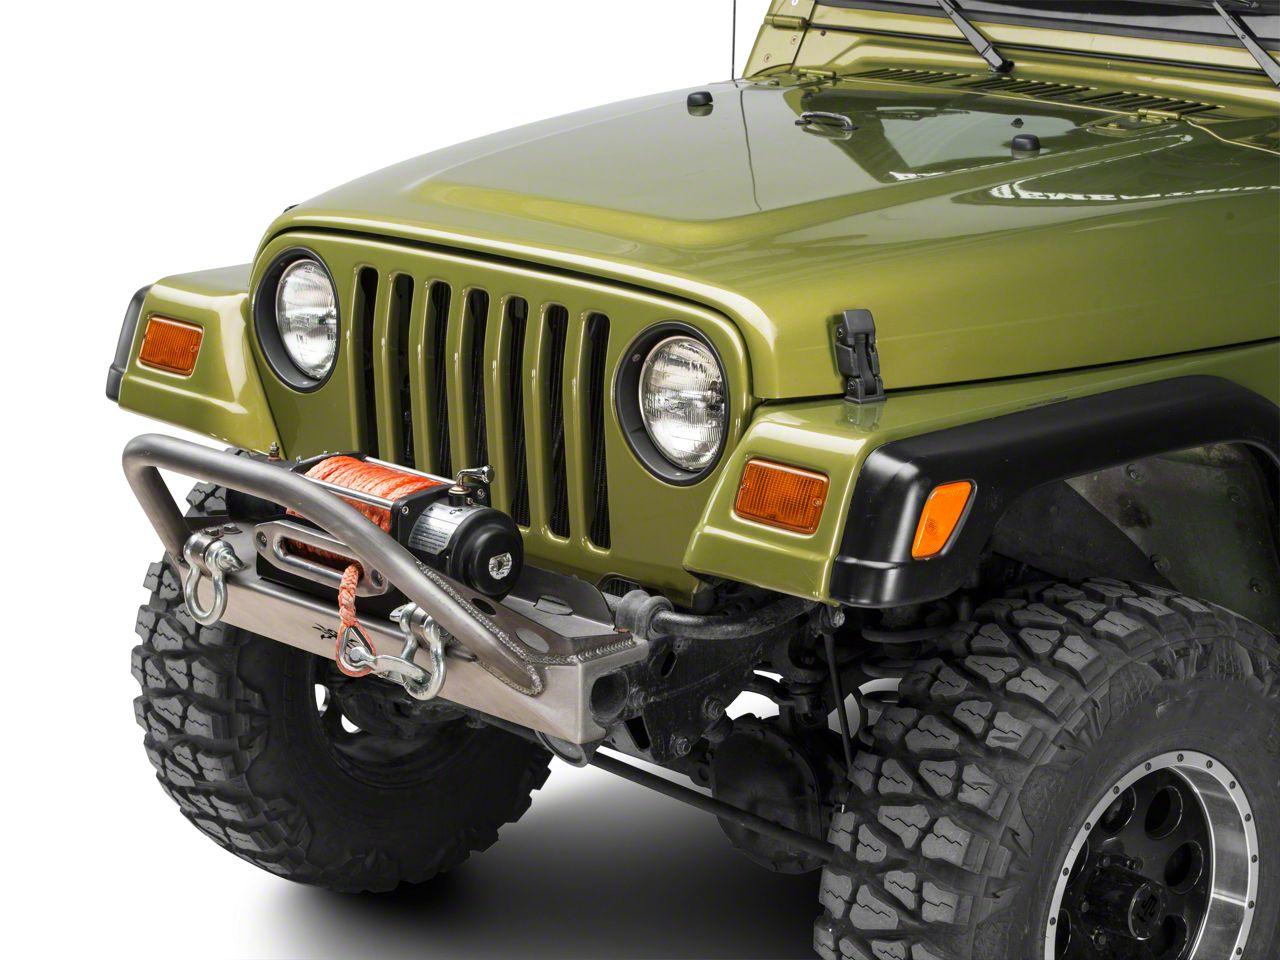 Poison Spyder BFH Front Bumper w/ Brawler Bar & Shackle Tabs - Bare Steel (97-06 Jeep Wrangler TJ)